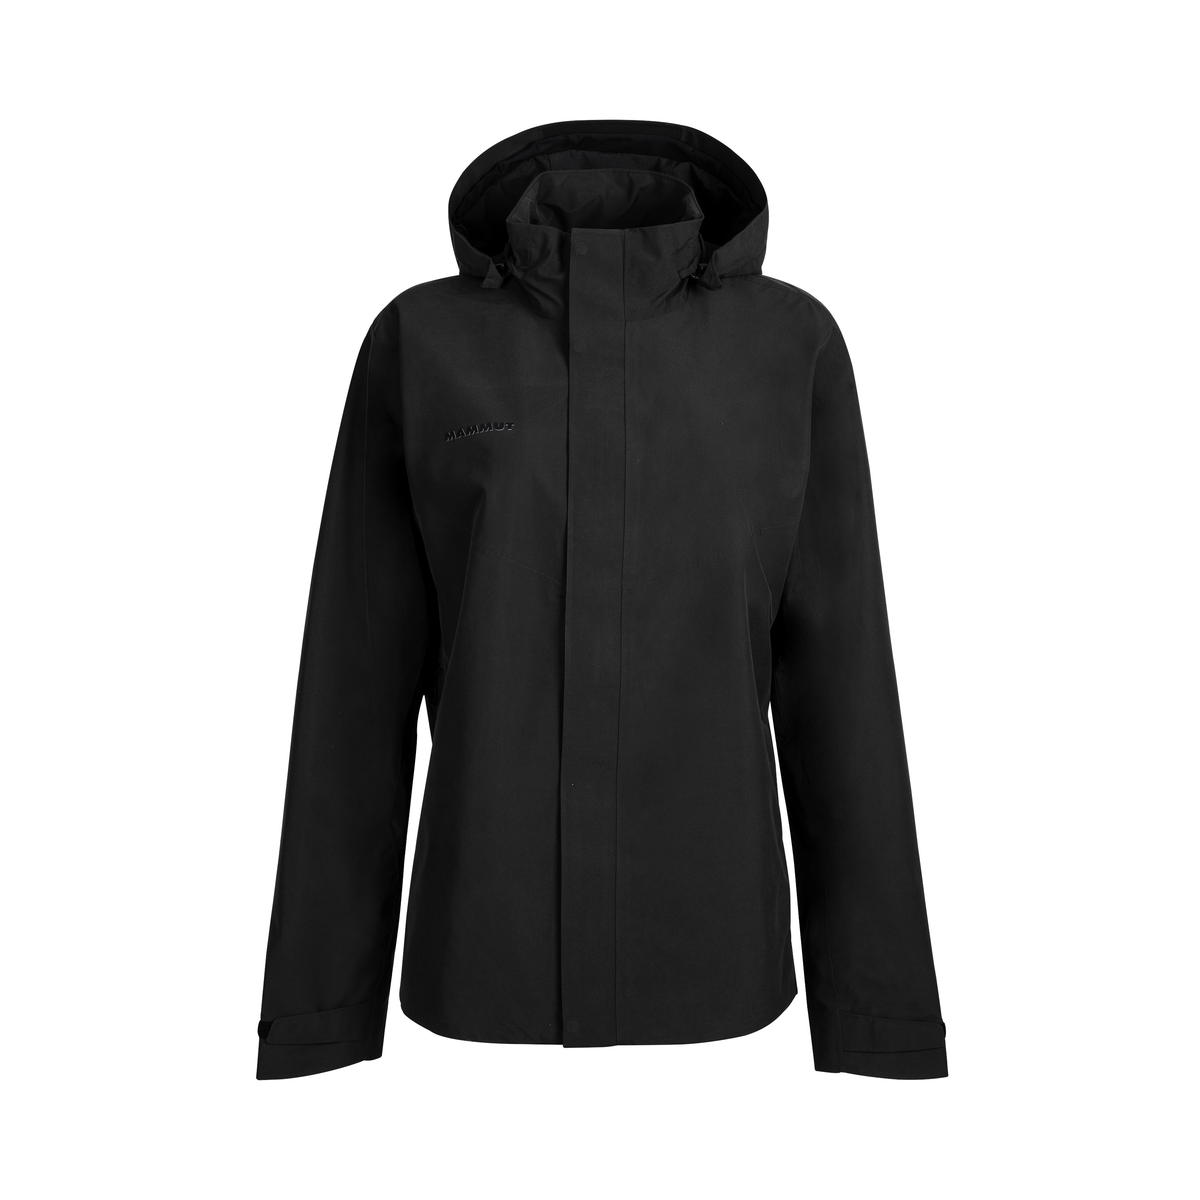 Laufschuhe High Fashion Abstand wählen Trovat HS Hooded Jacket Men